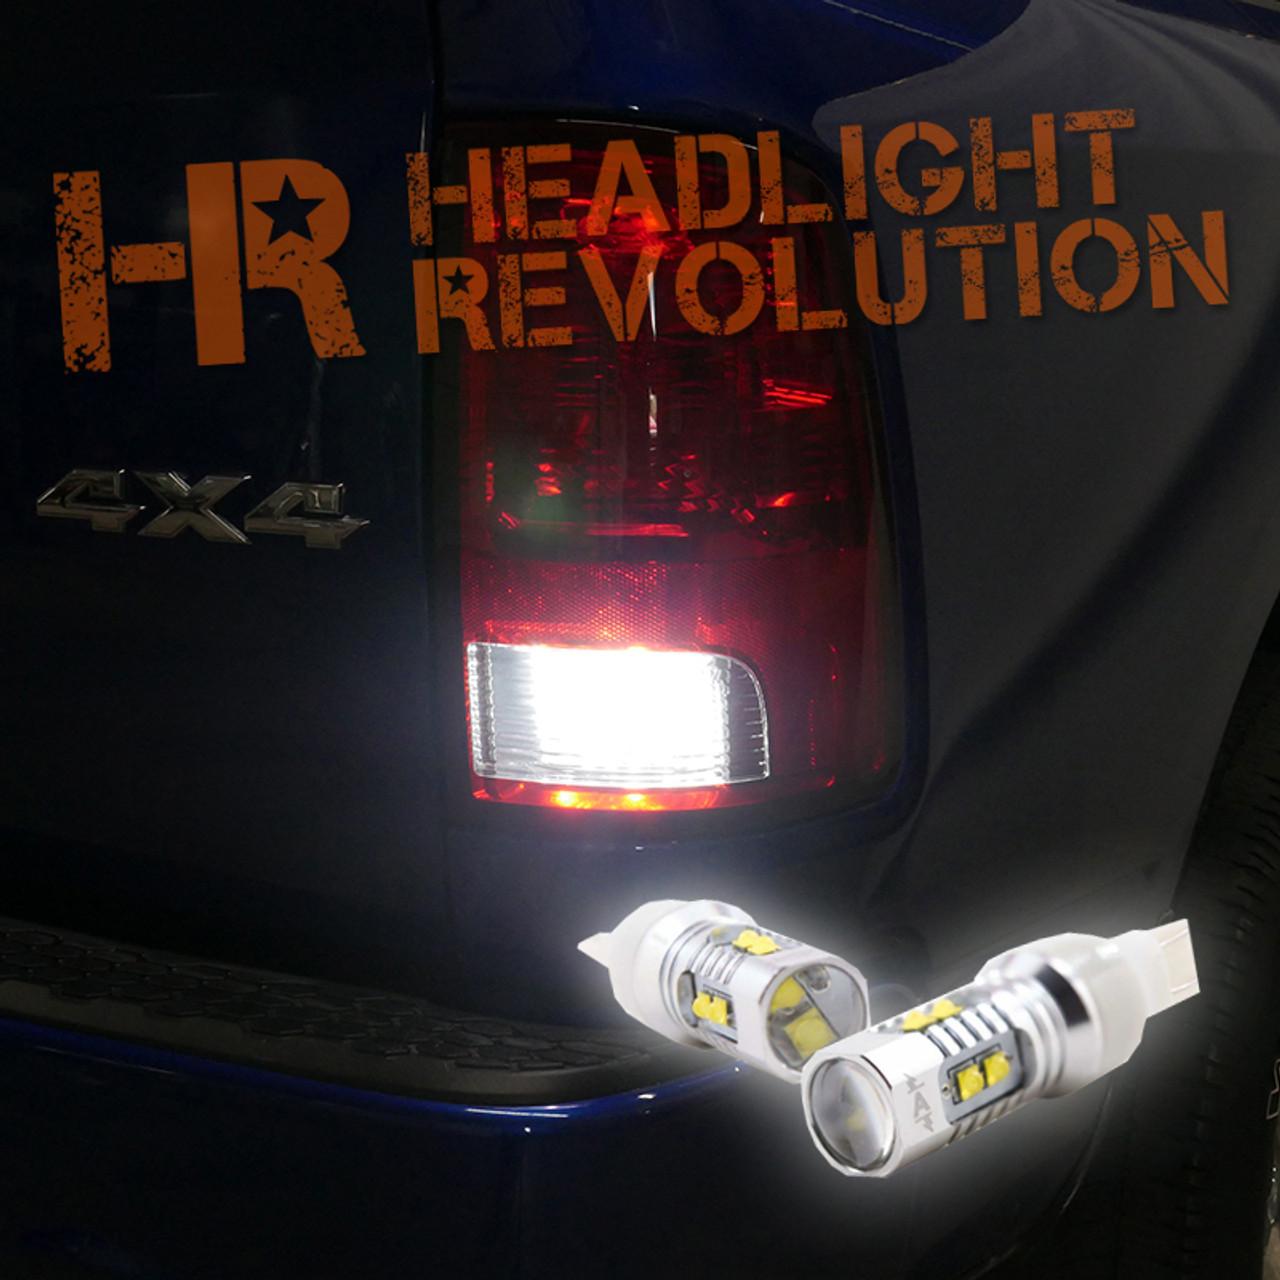 2009 2018 Dodge Ram Led Reverse Bulbs Upgrade Headlight Revolution. 2009 2018 Dodge Ram Led Reverse Bulbs Upgrade. Dodge. Dodge Tail Light Harness Flat At Scoala.co